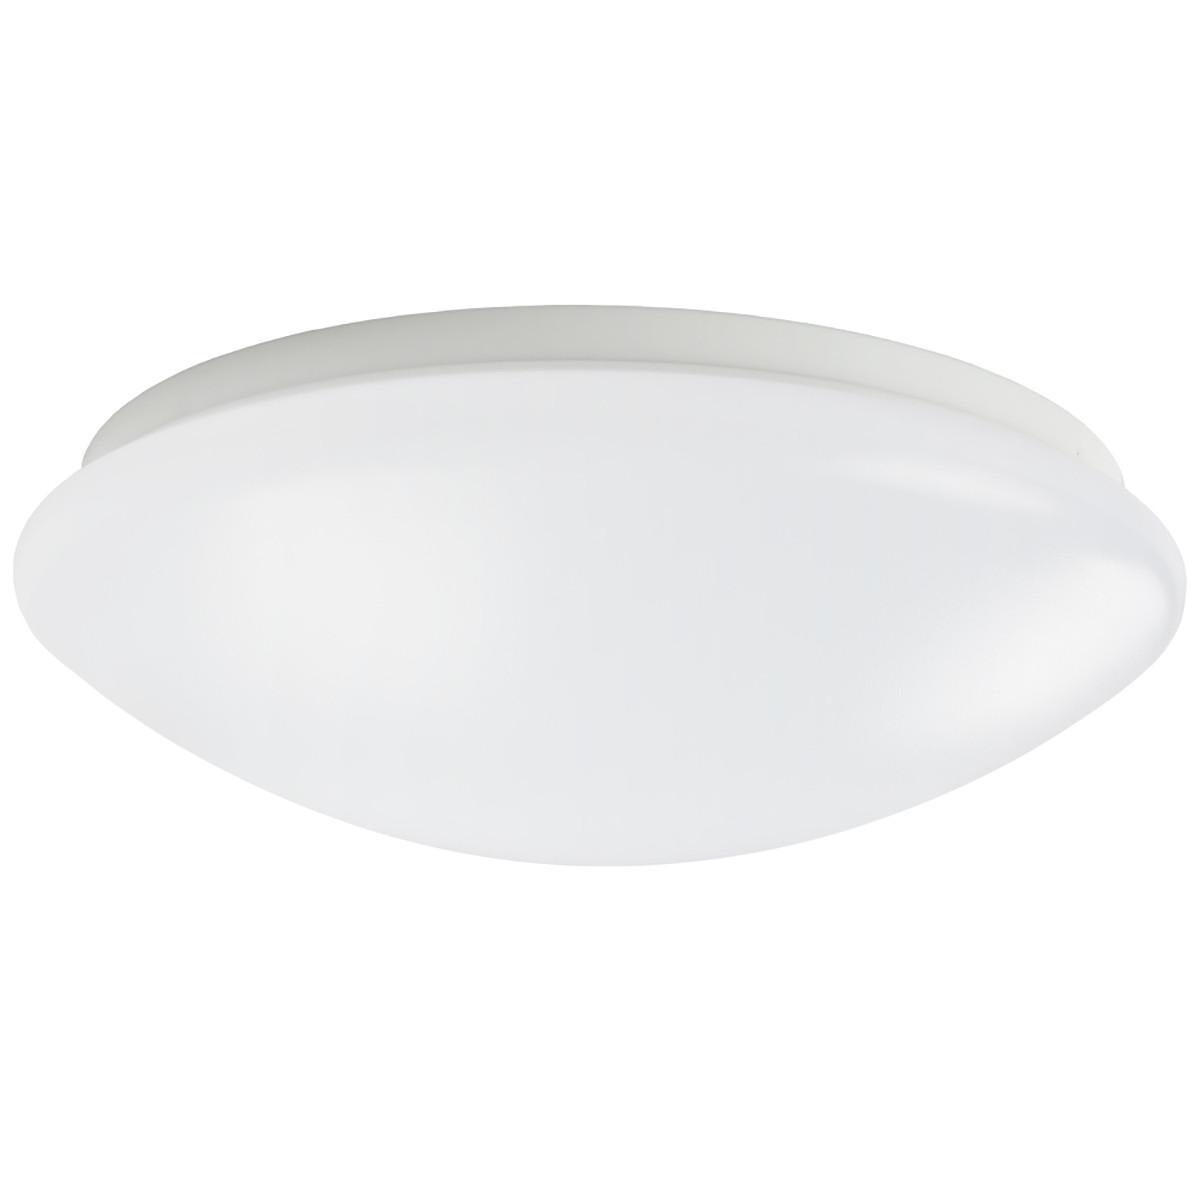 White Acrylic Led Ceiling Light Fixture Flush Mount Lamp: 12W 10.24inch Modern LED Flush Mount Ceiling Light Fixture